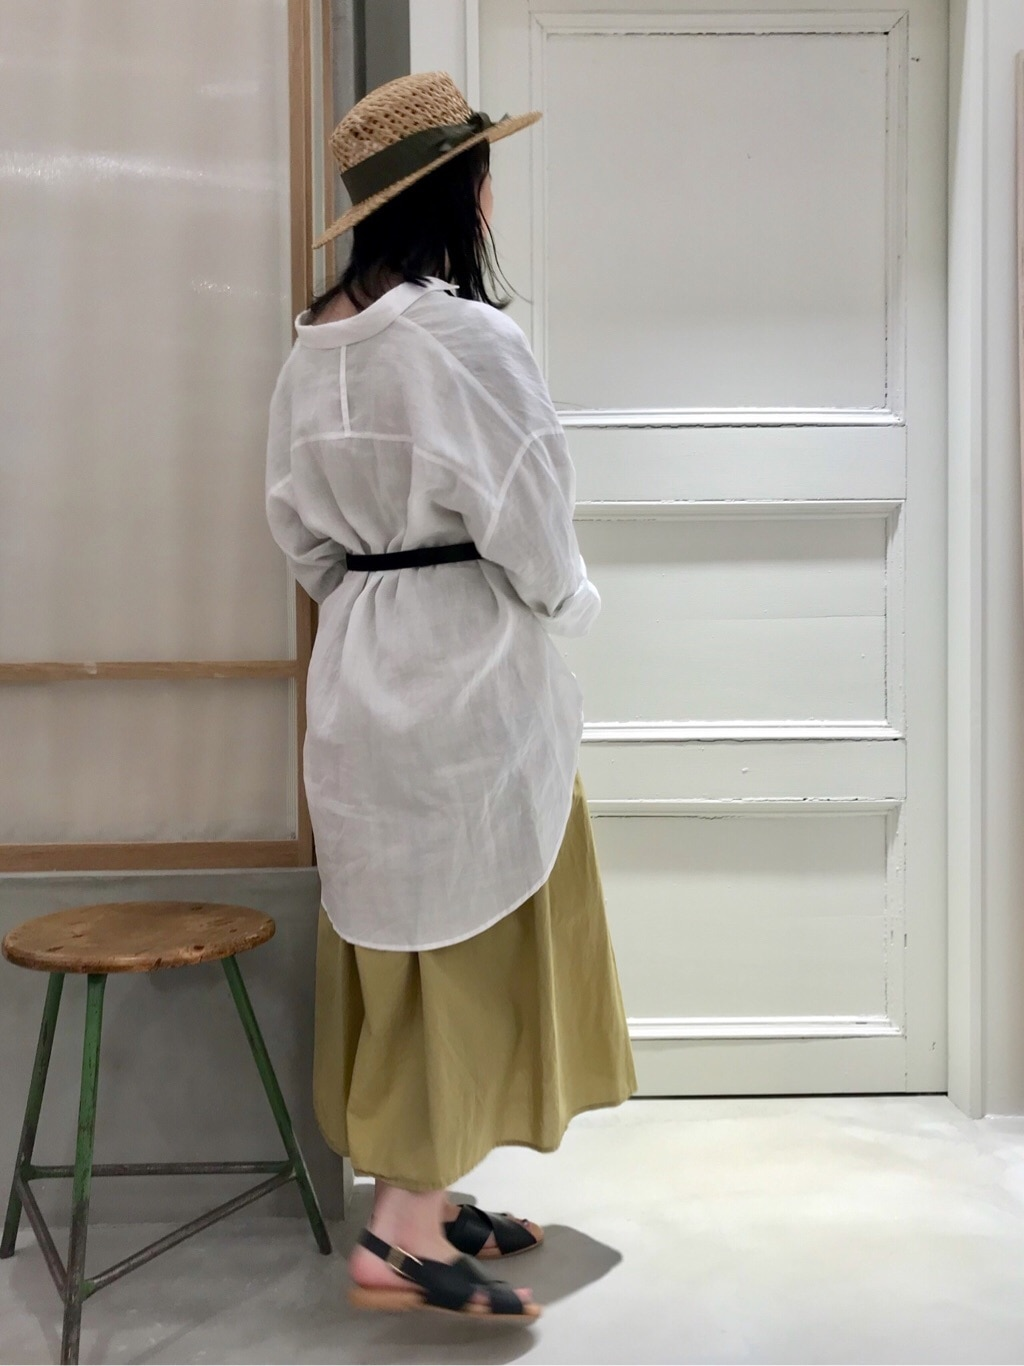 bulle de savon 渋谷スクランブルスクエア 身長:153cm 2020.06.27